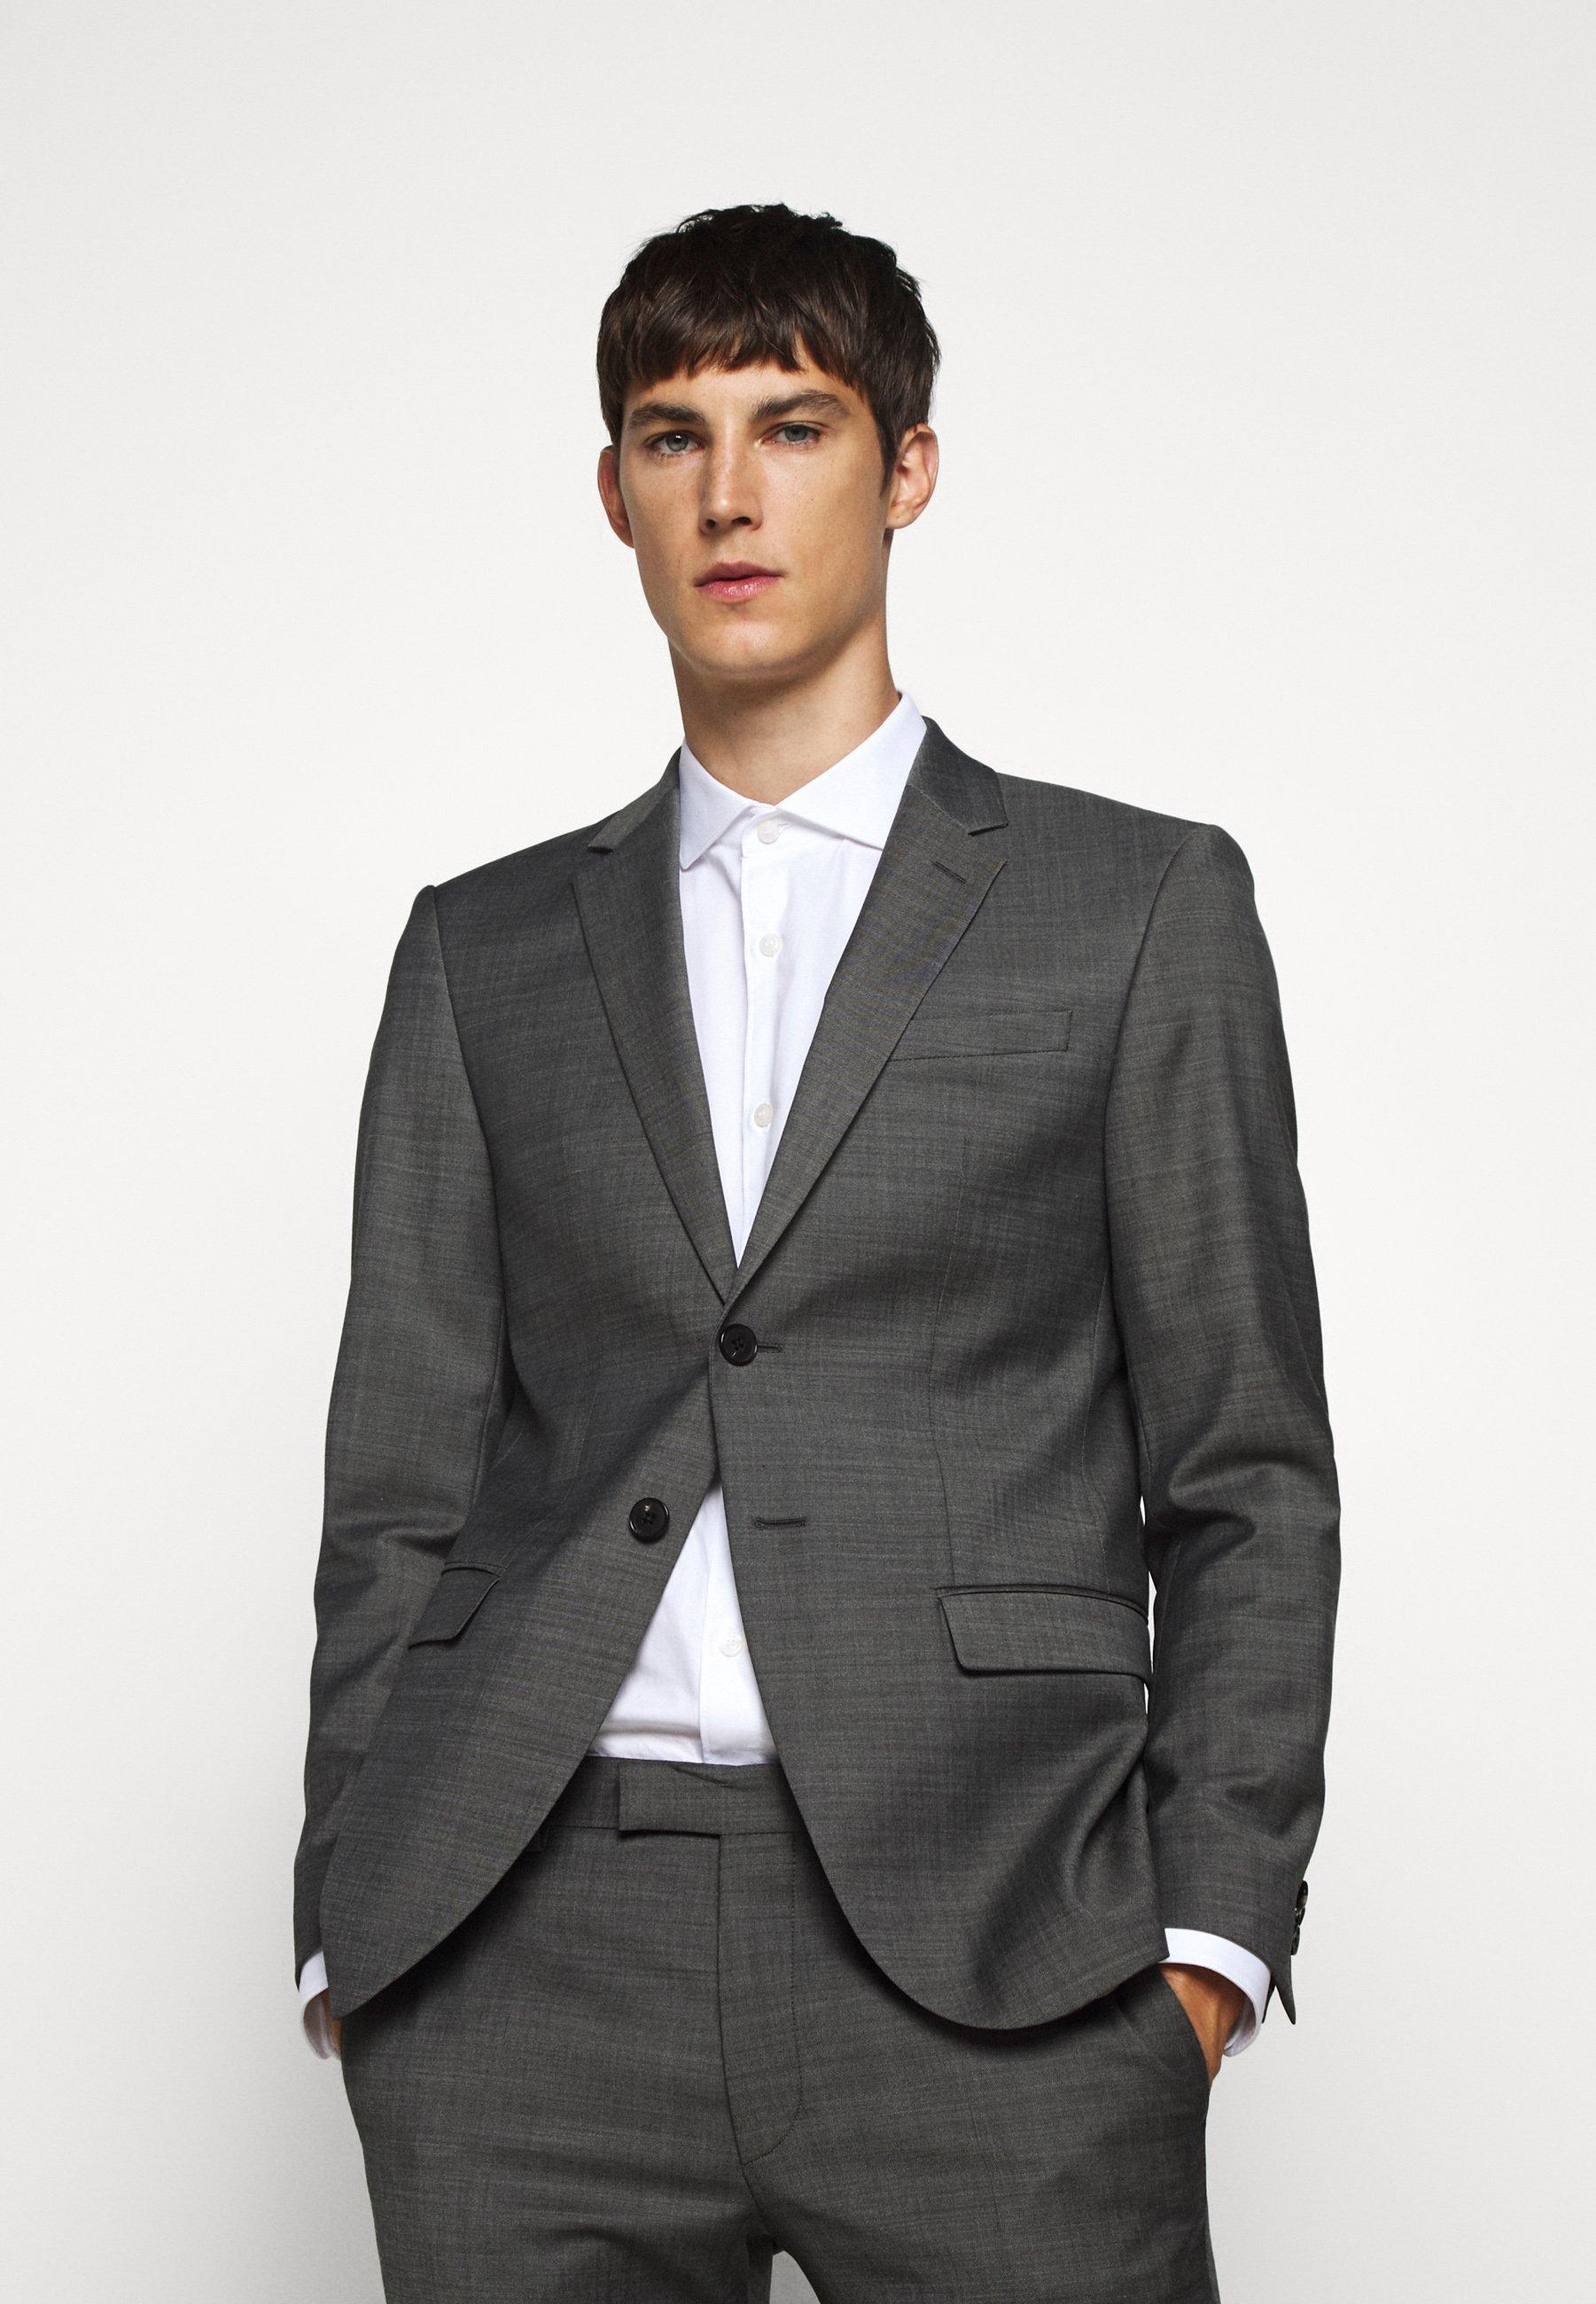 JOOP! DAMON GUN - Dress - grey